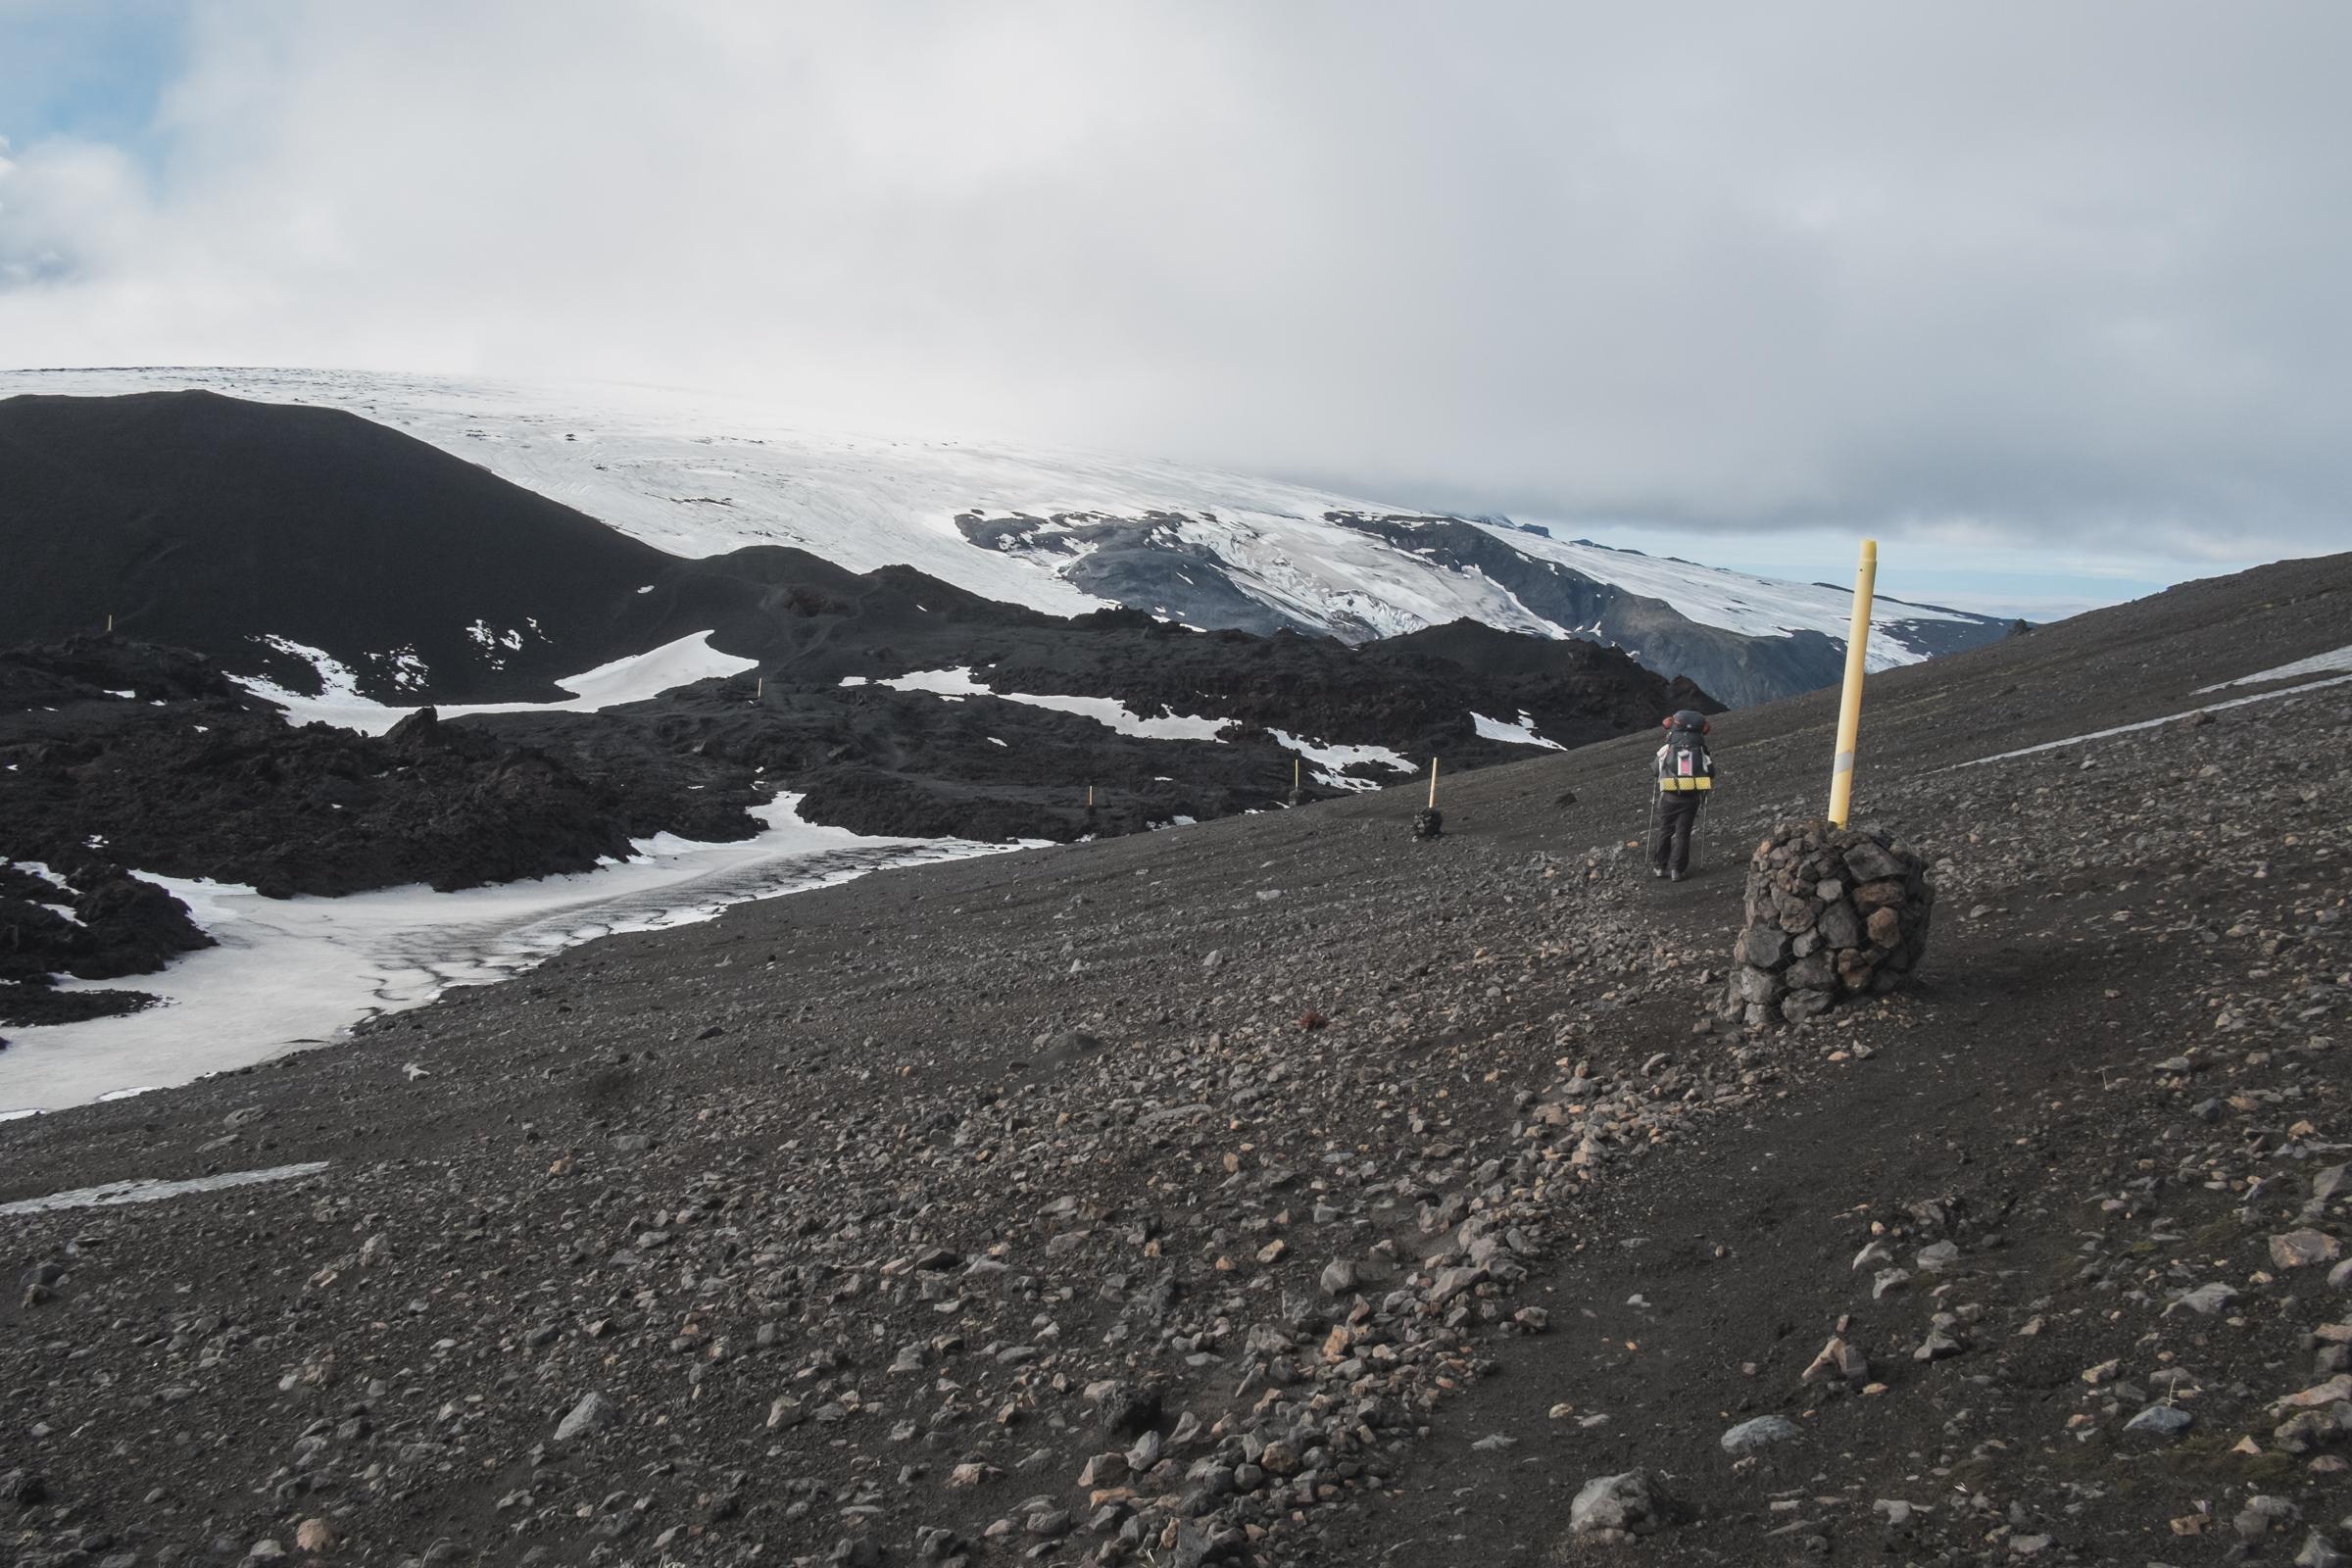 20131004-027-Iceland_Travel_Editorial.jpg